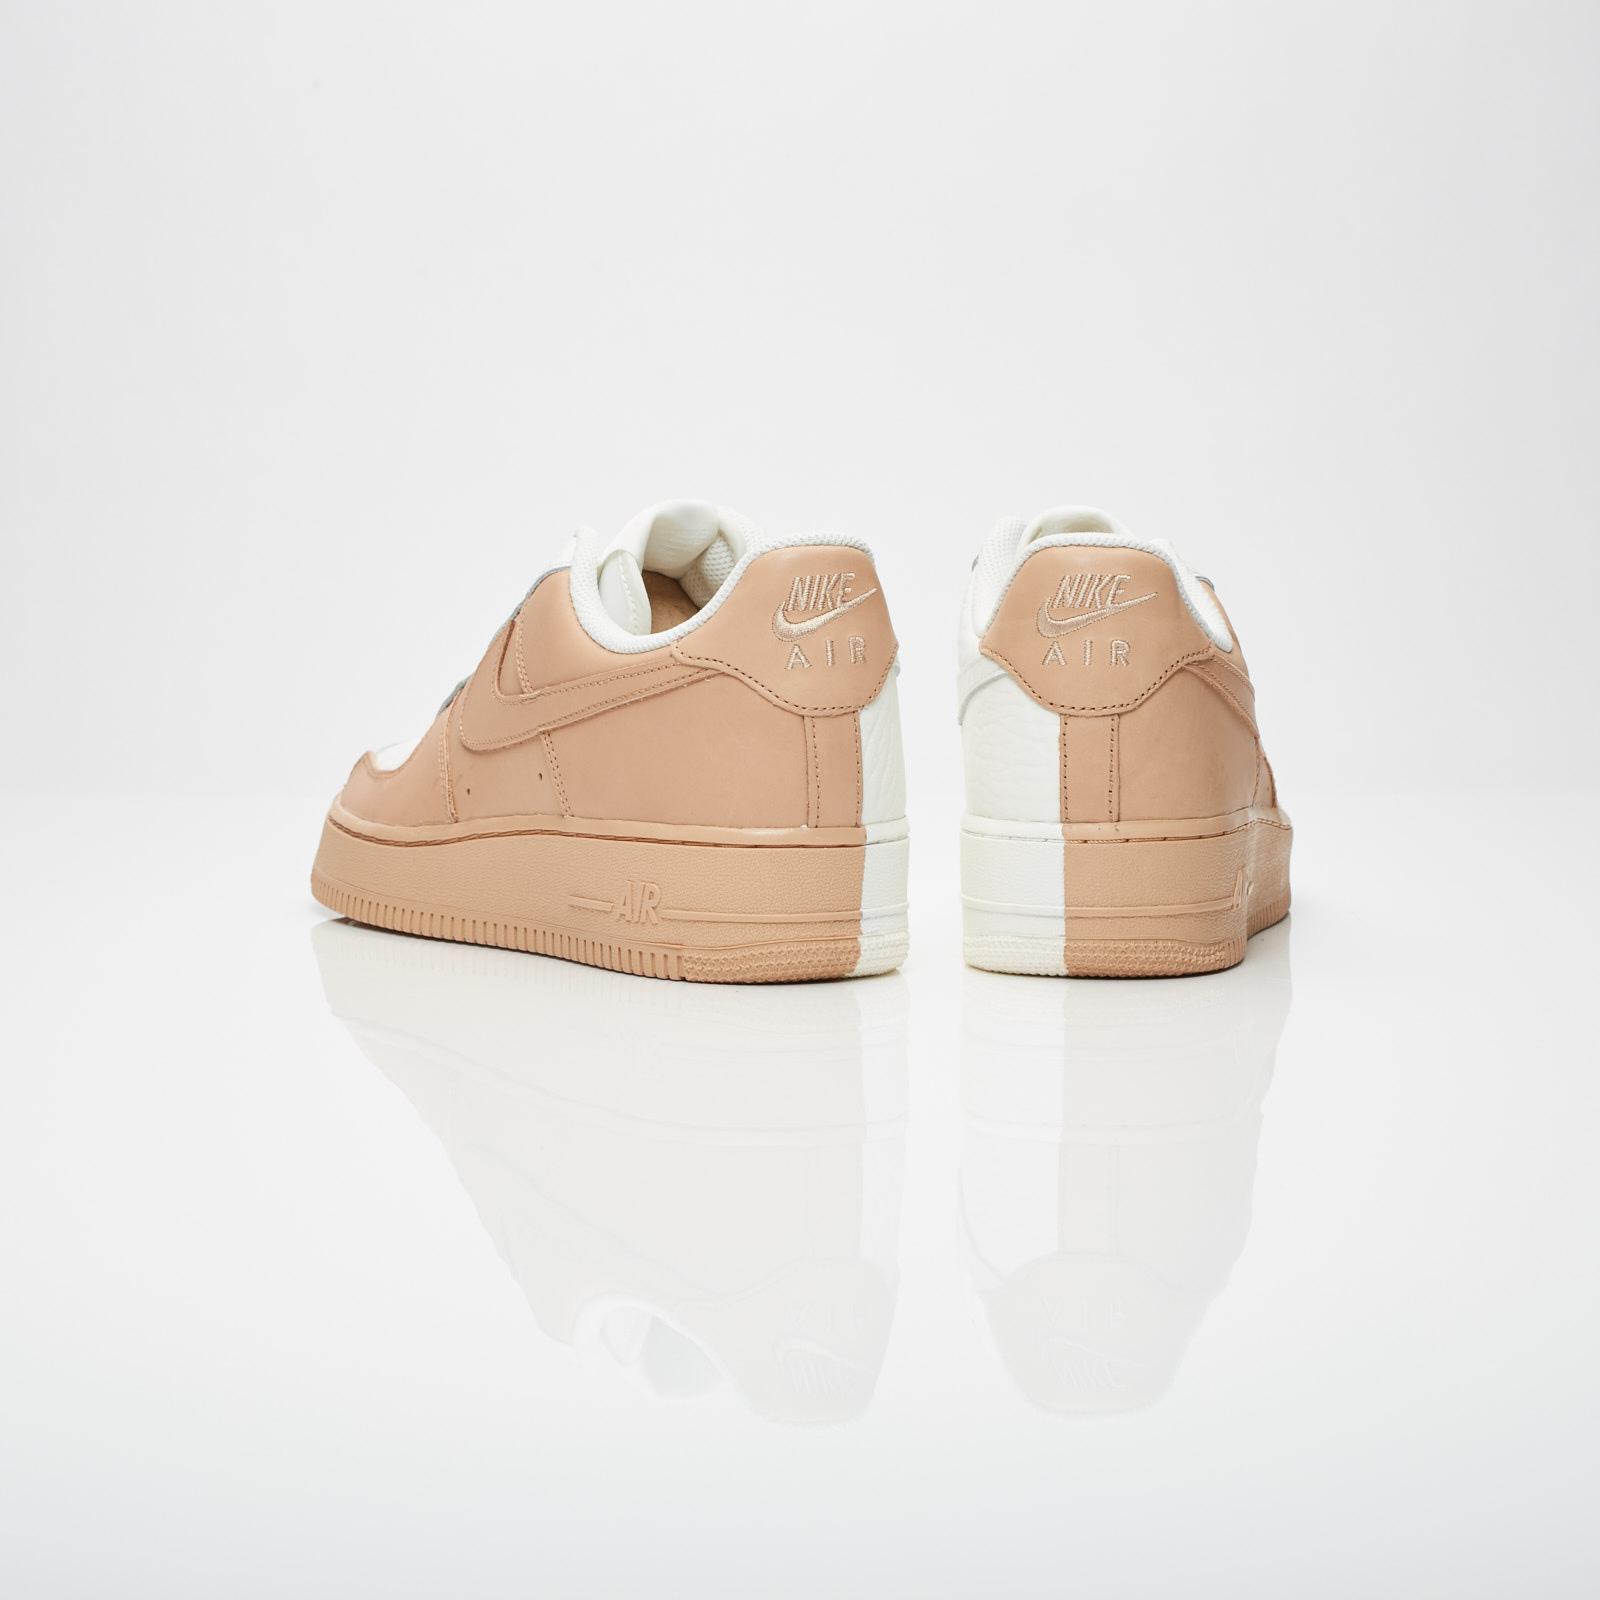 reputable site f2dd4 36a5f Nike Air Force 1 07 Premium - 905345-105 - Sneakersnstuff   sneakers    streetwear online since 1999